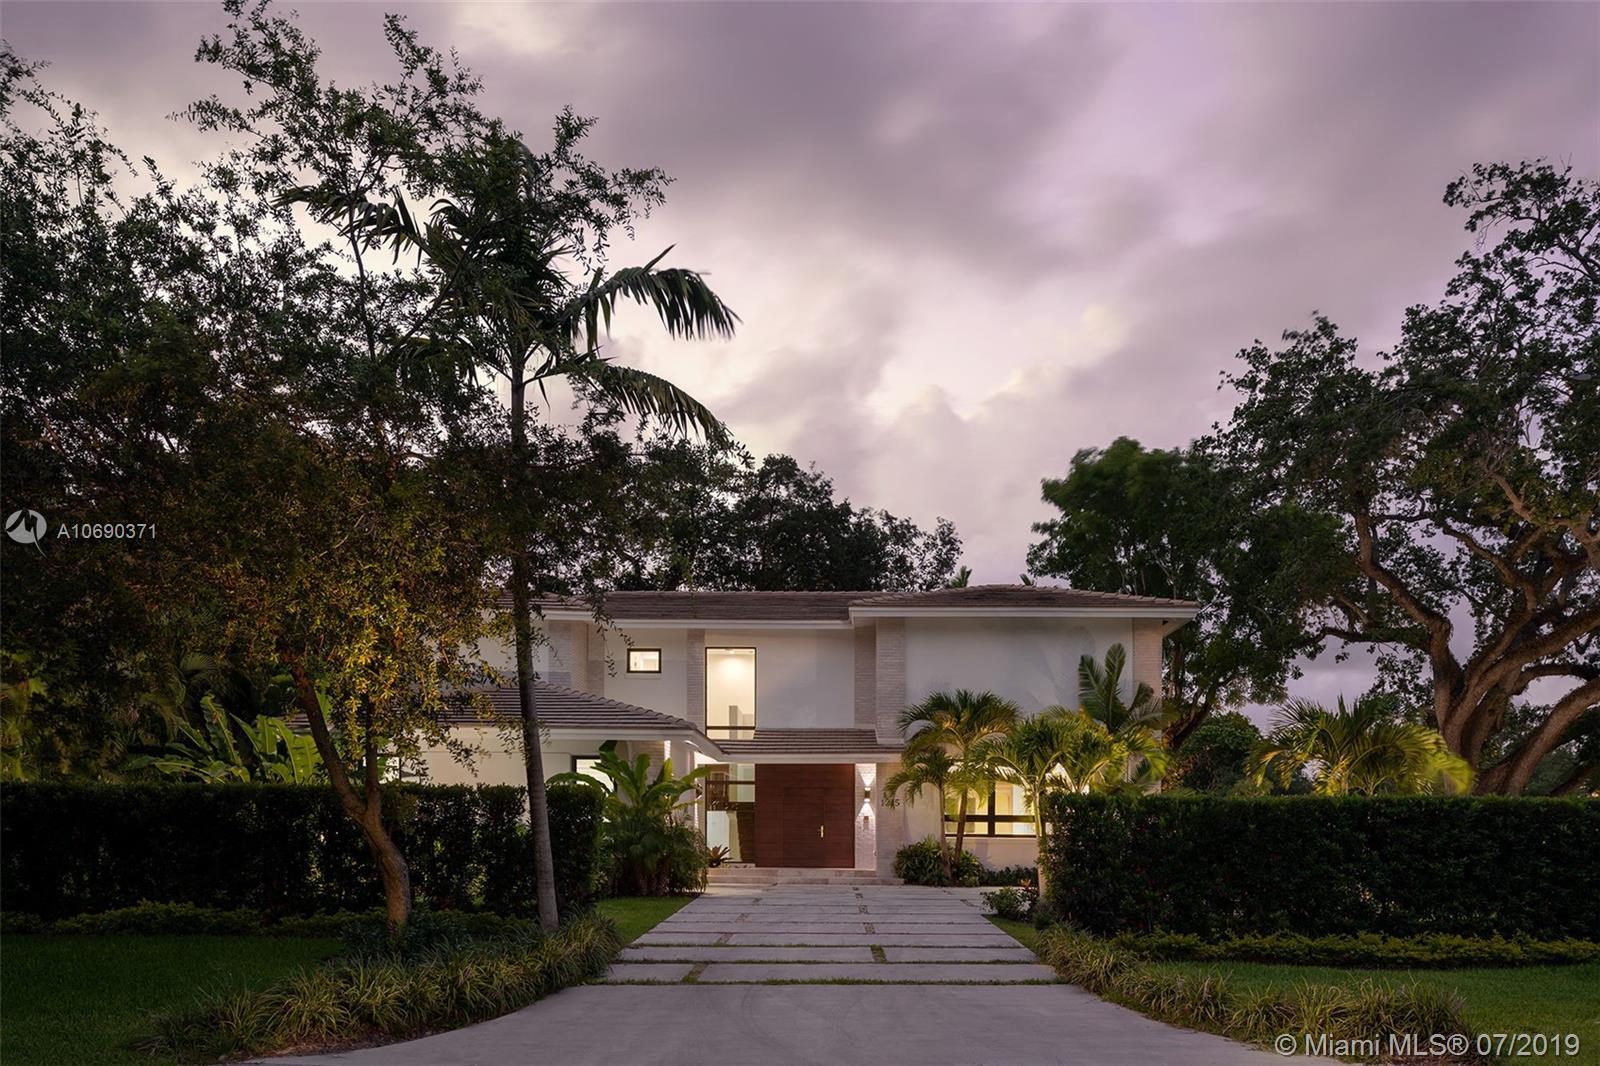 South Miami - 1215 Blue Rd, Coral Gables, FL 33146